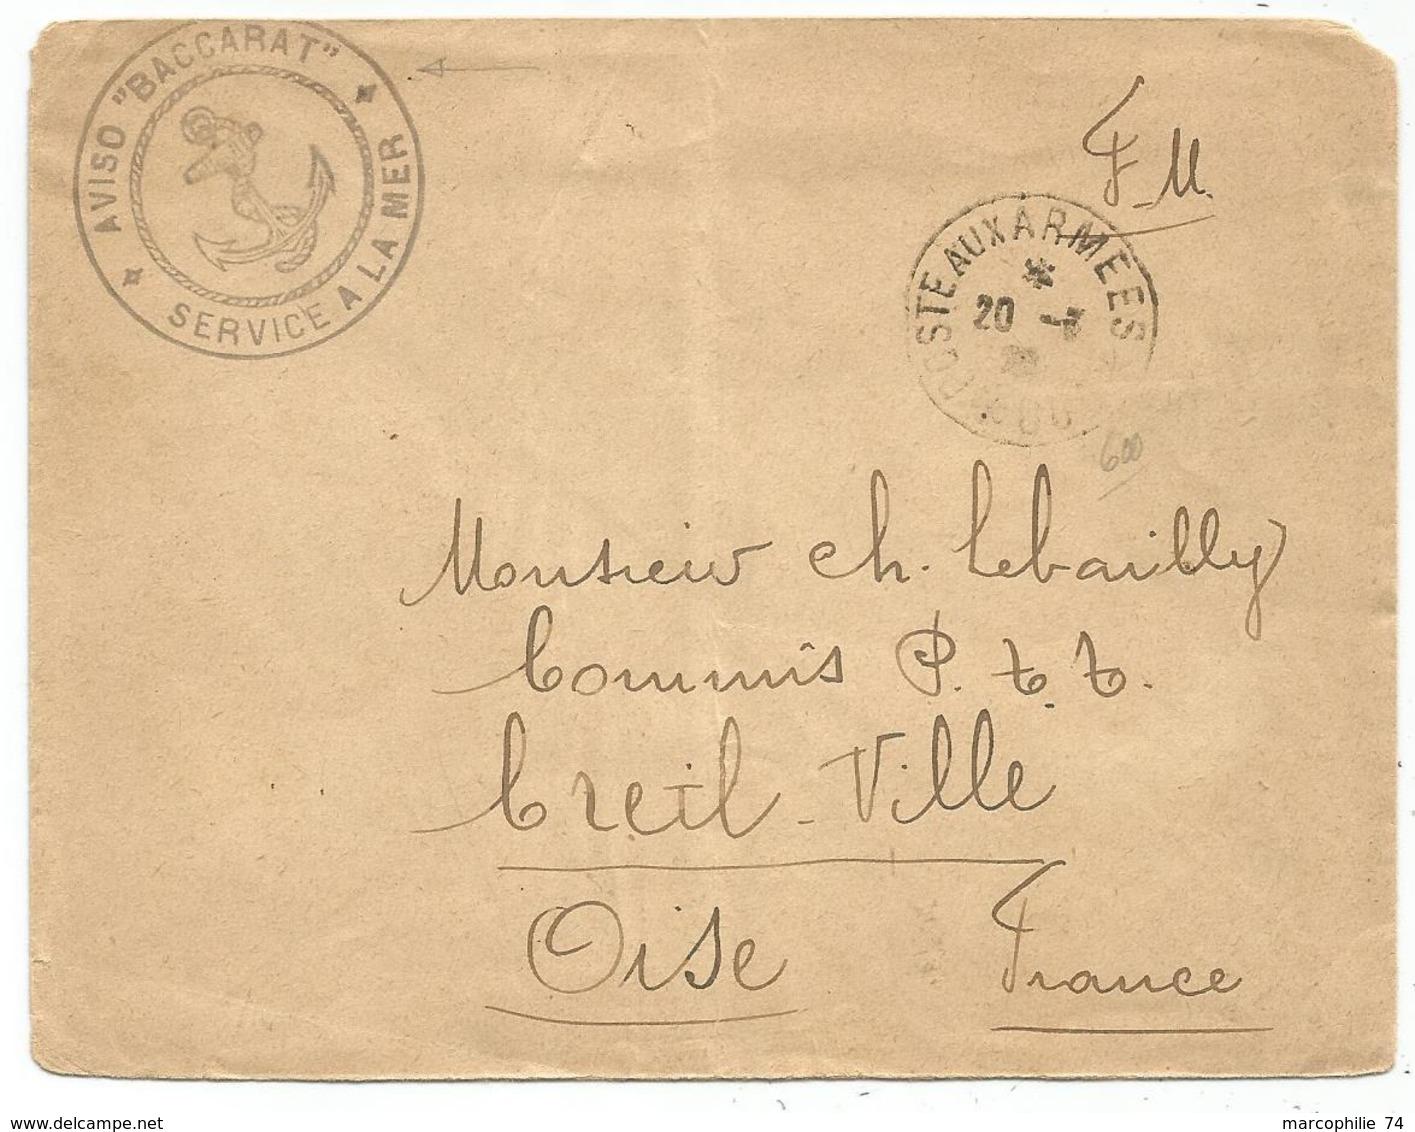 LETTRE POSTE AUX ARMEES 600 20.3.1928 + AVISO BACCARAT SERVICE DE LA MER - Posta Marittima